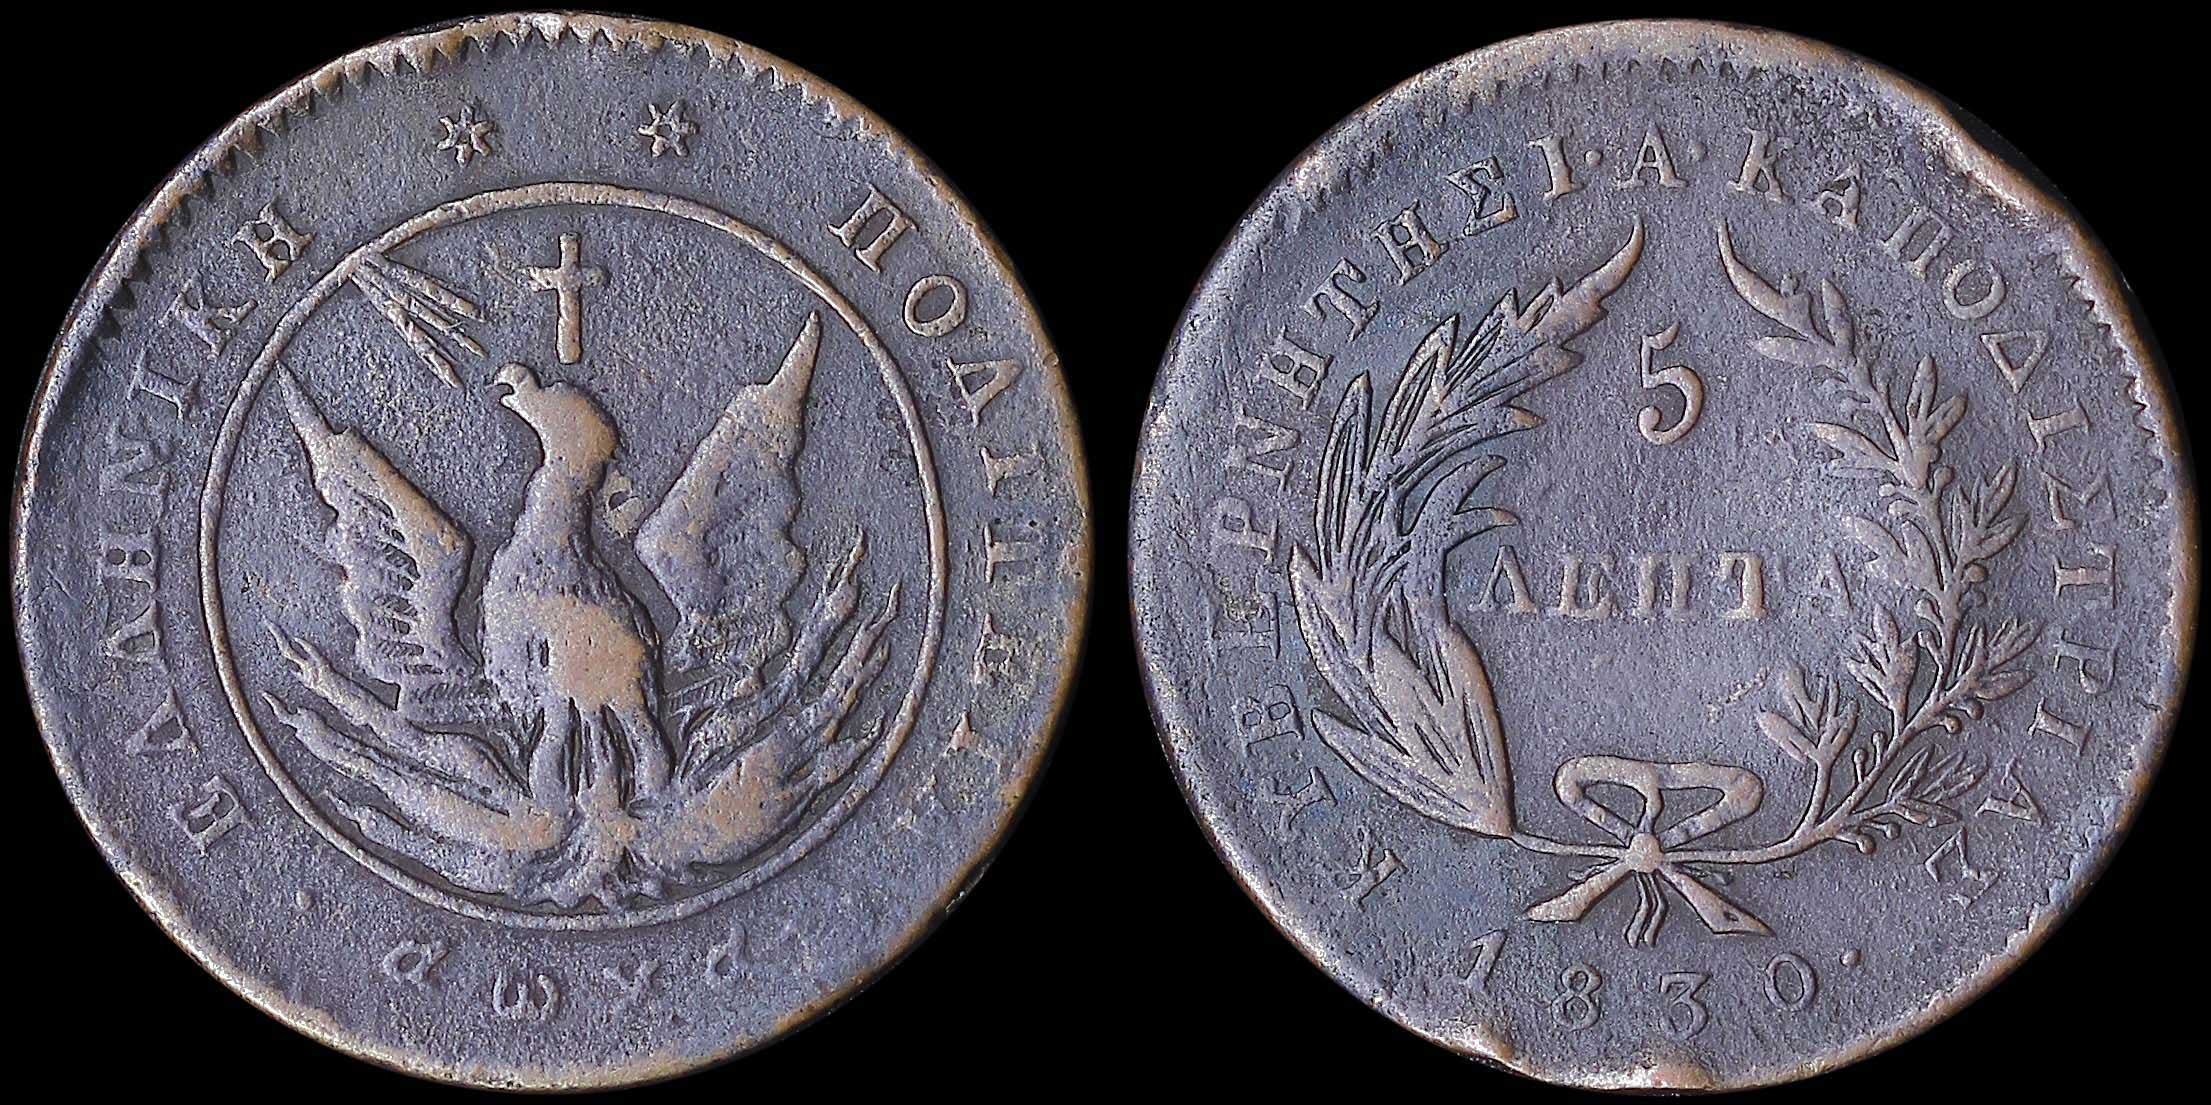 Lot 6015 - -  COINS & TOKENS governor capodistrias -  A. Karamitsos Public & Live Internet Auction 665 Coins, Medals & Banknotes